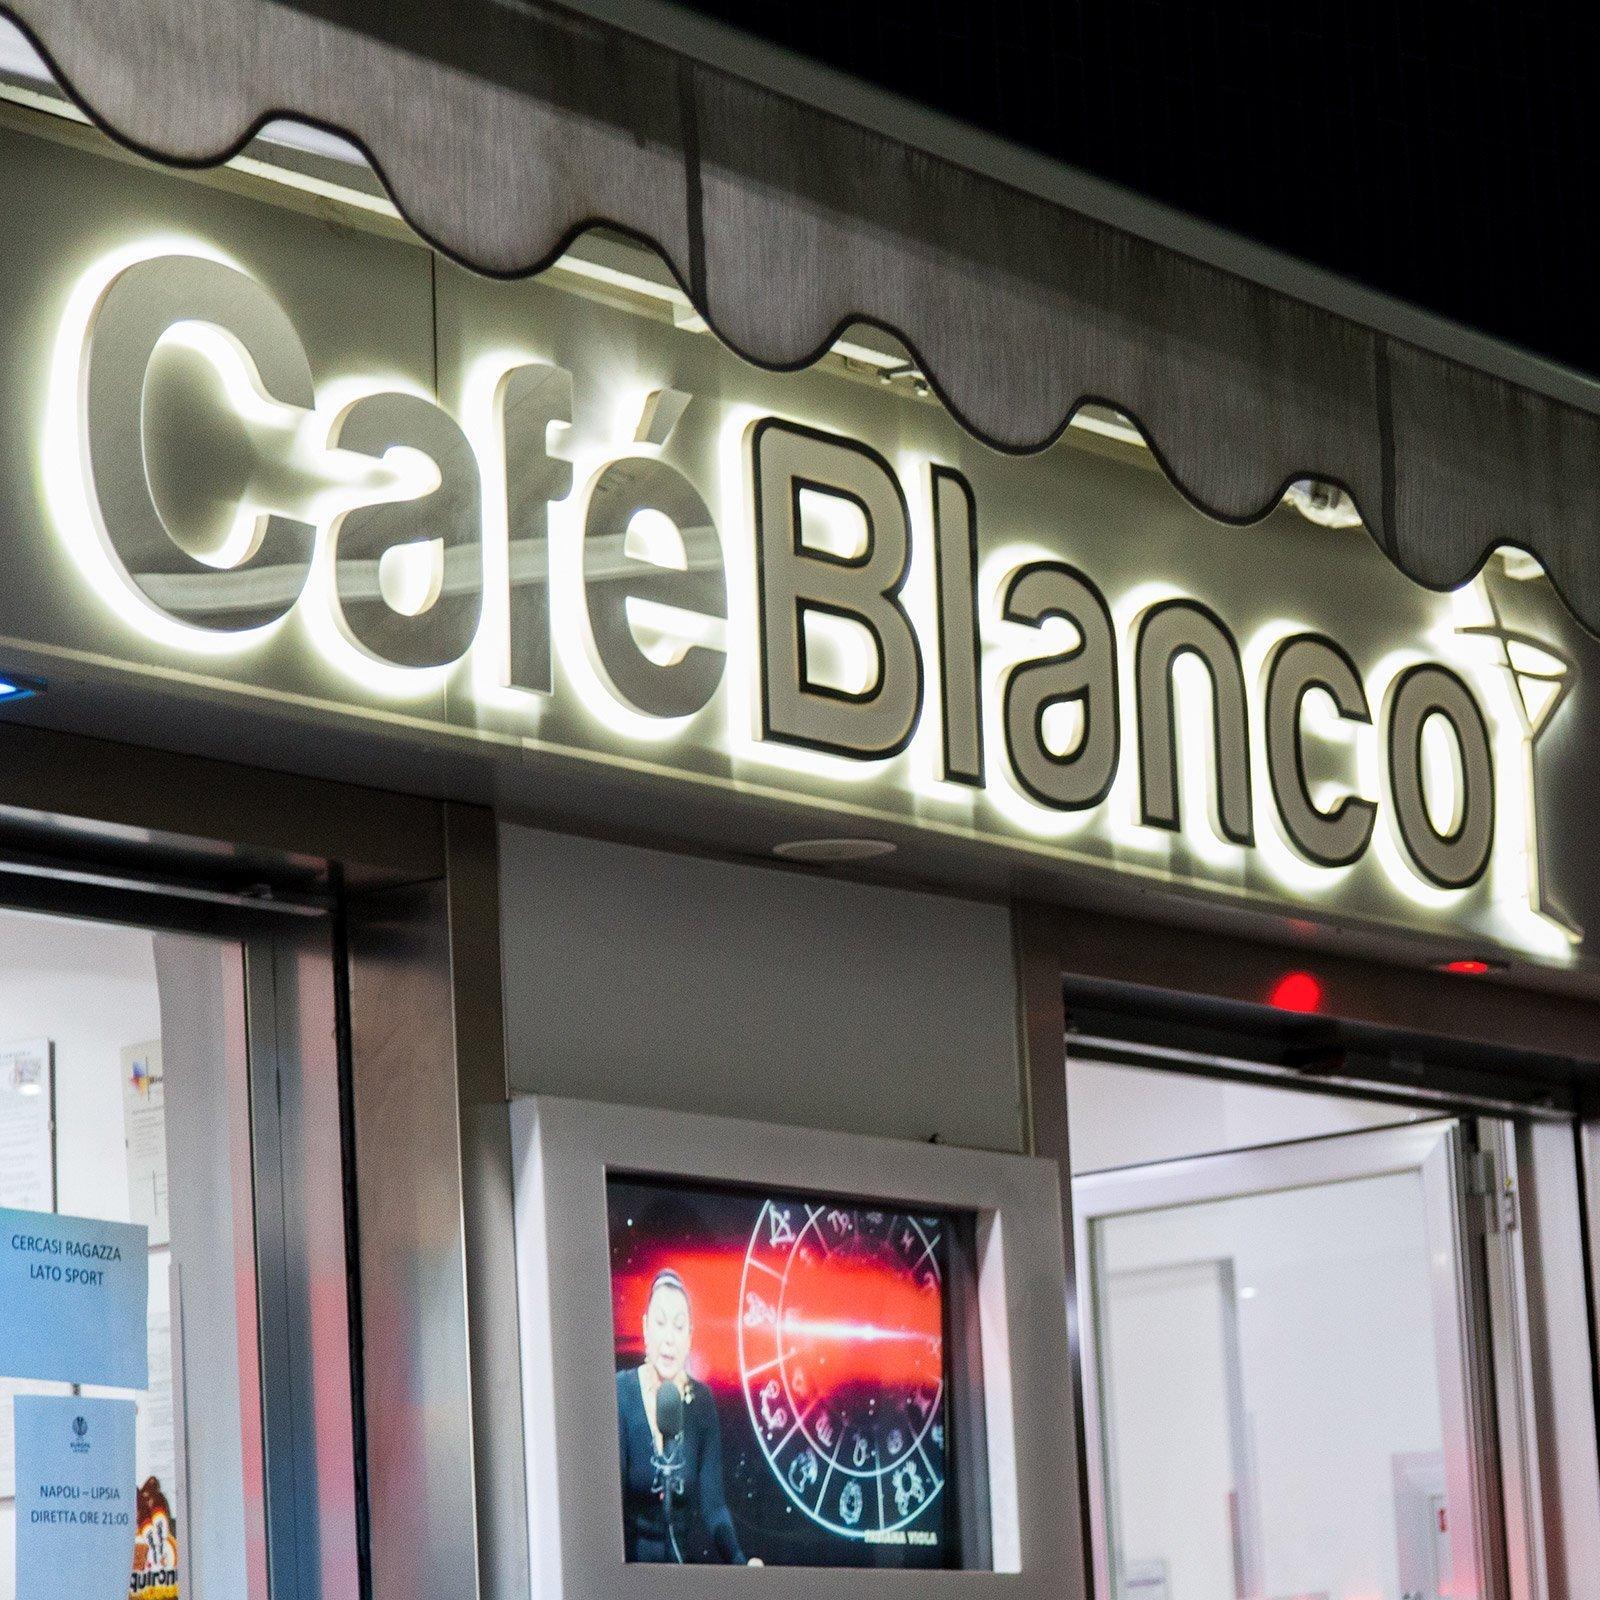 Insegna Café Blanco